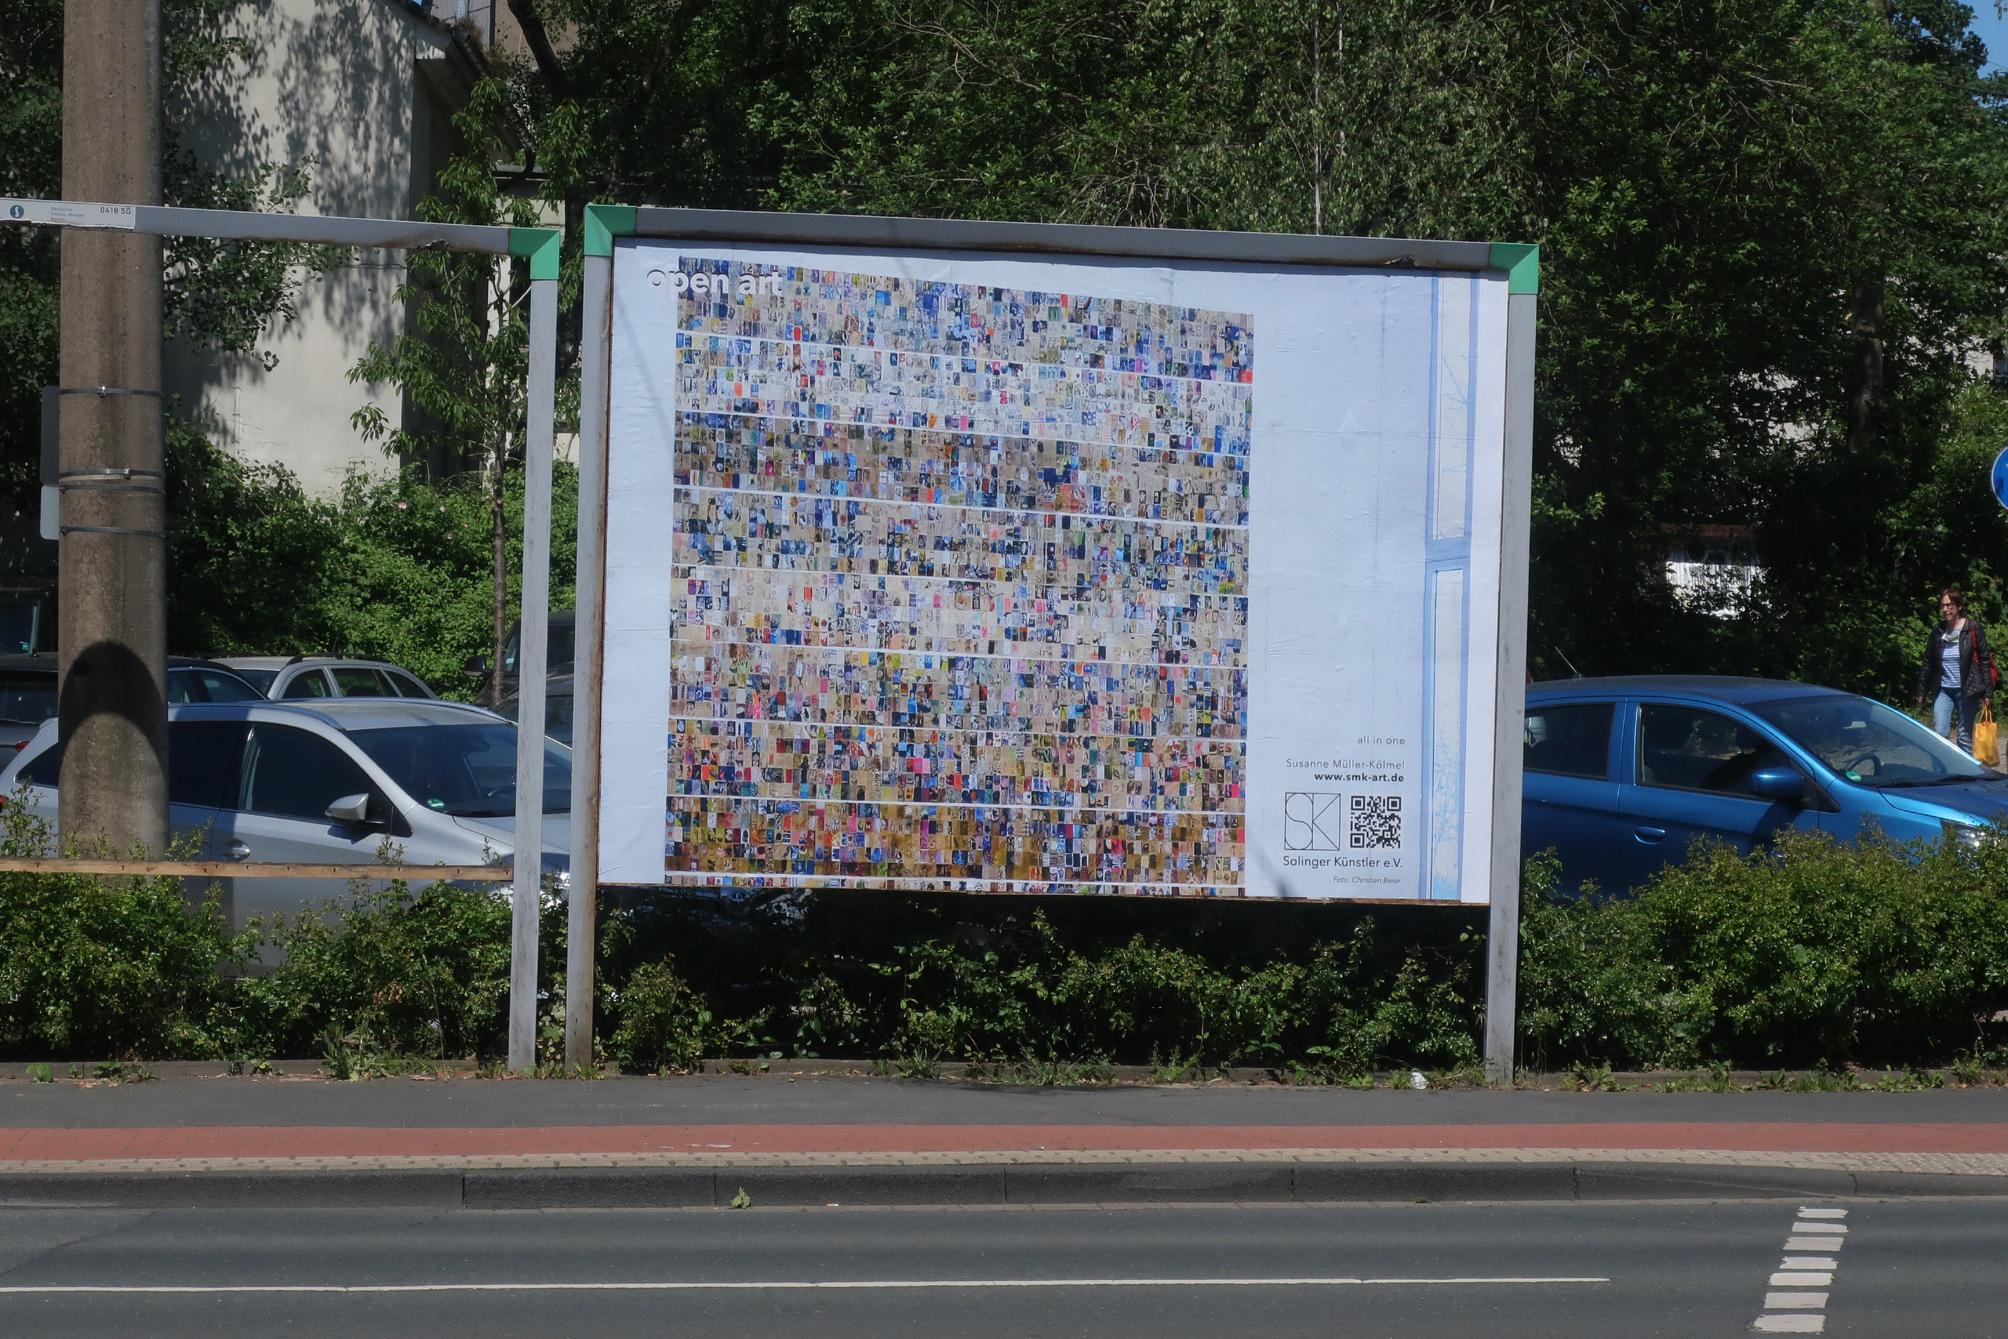 Susanne Müller-Kölmel, Birker Str., neben Hallenbad, Innenstadt - www.smk-art.de